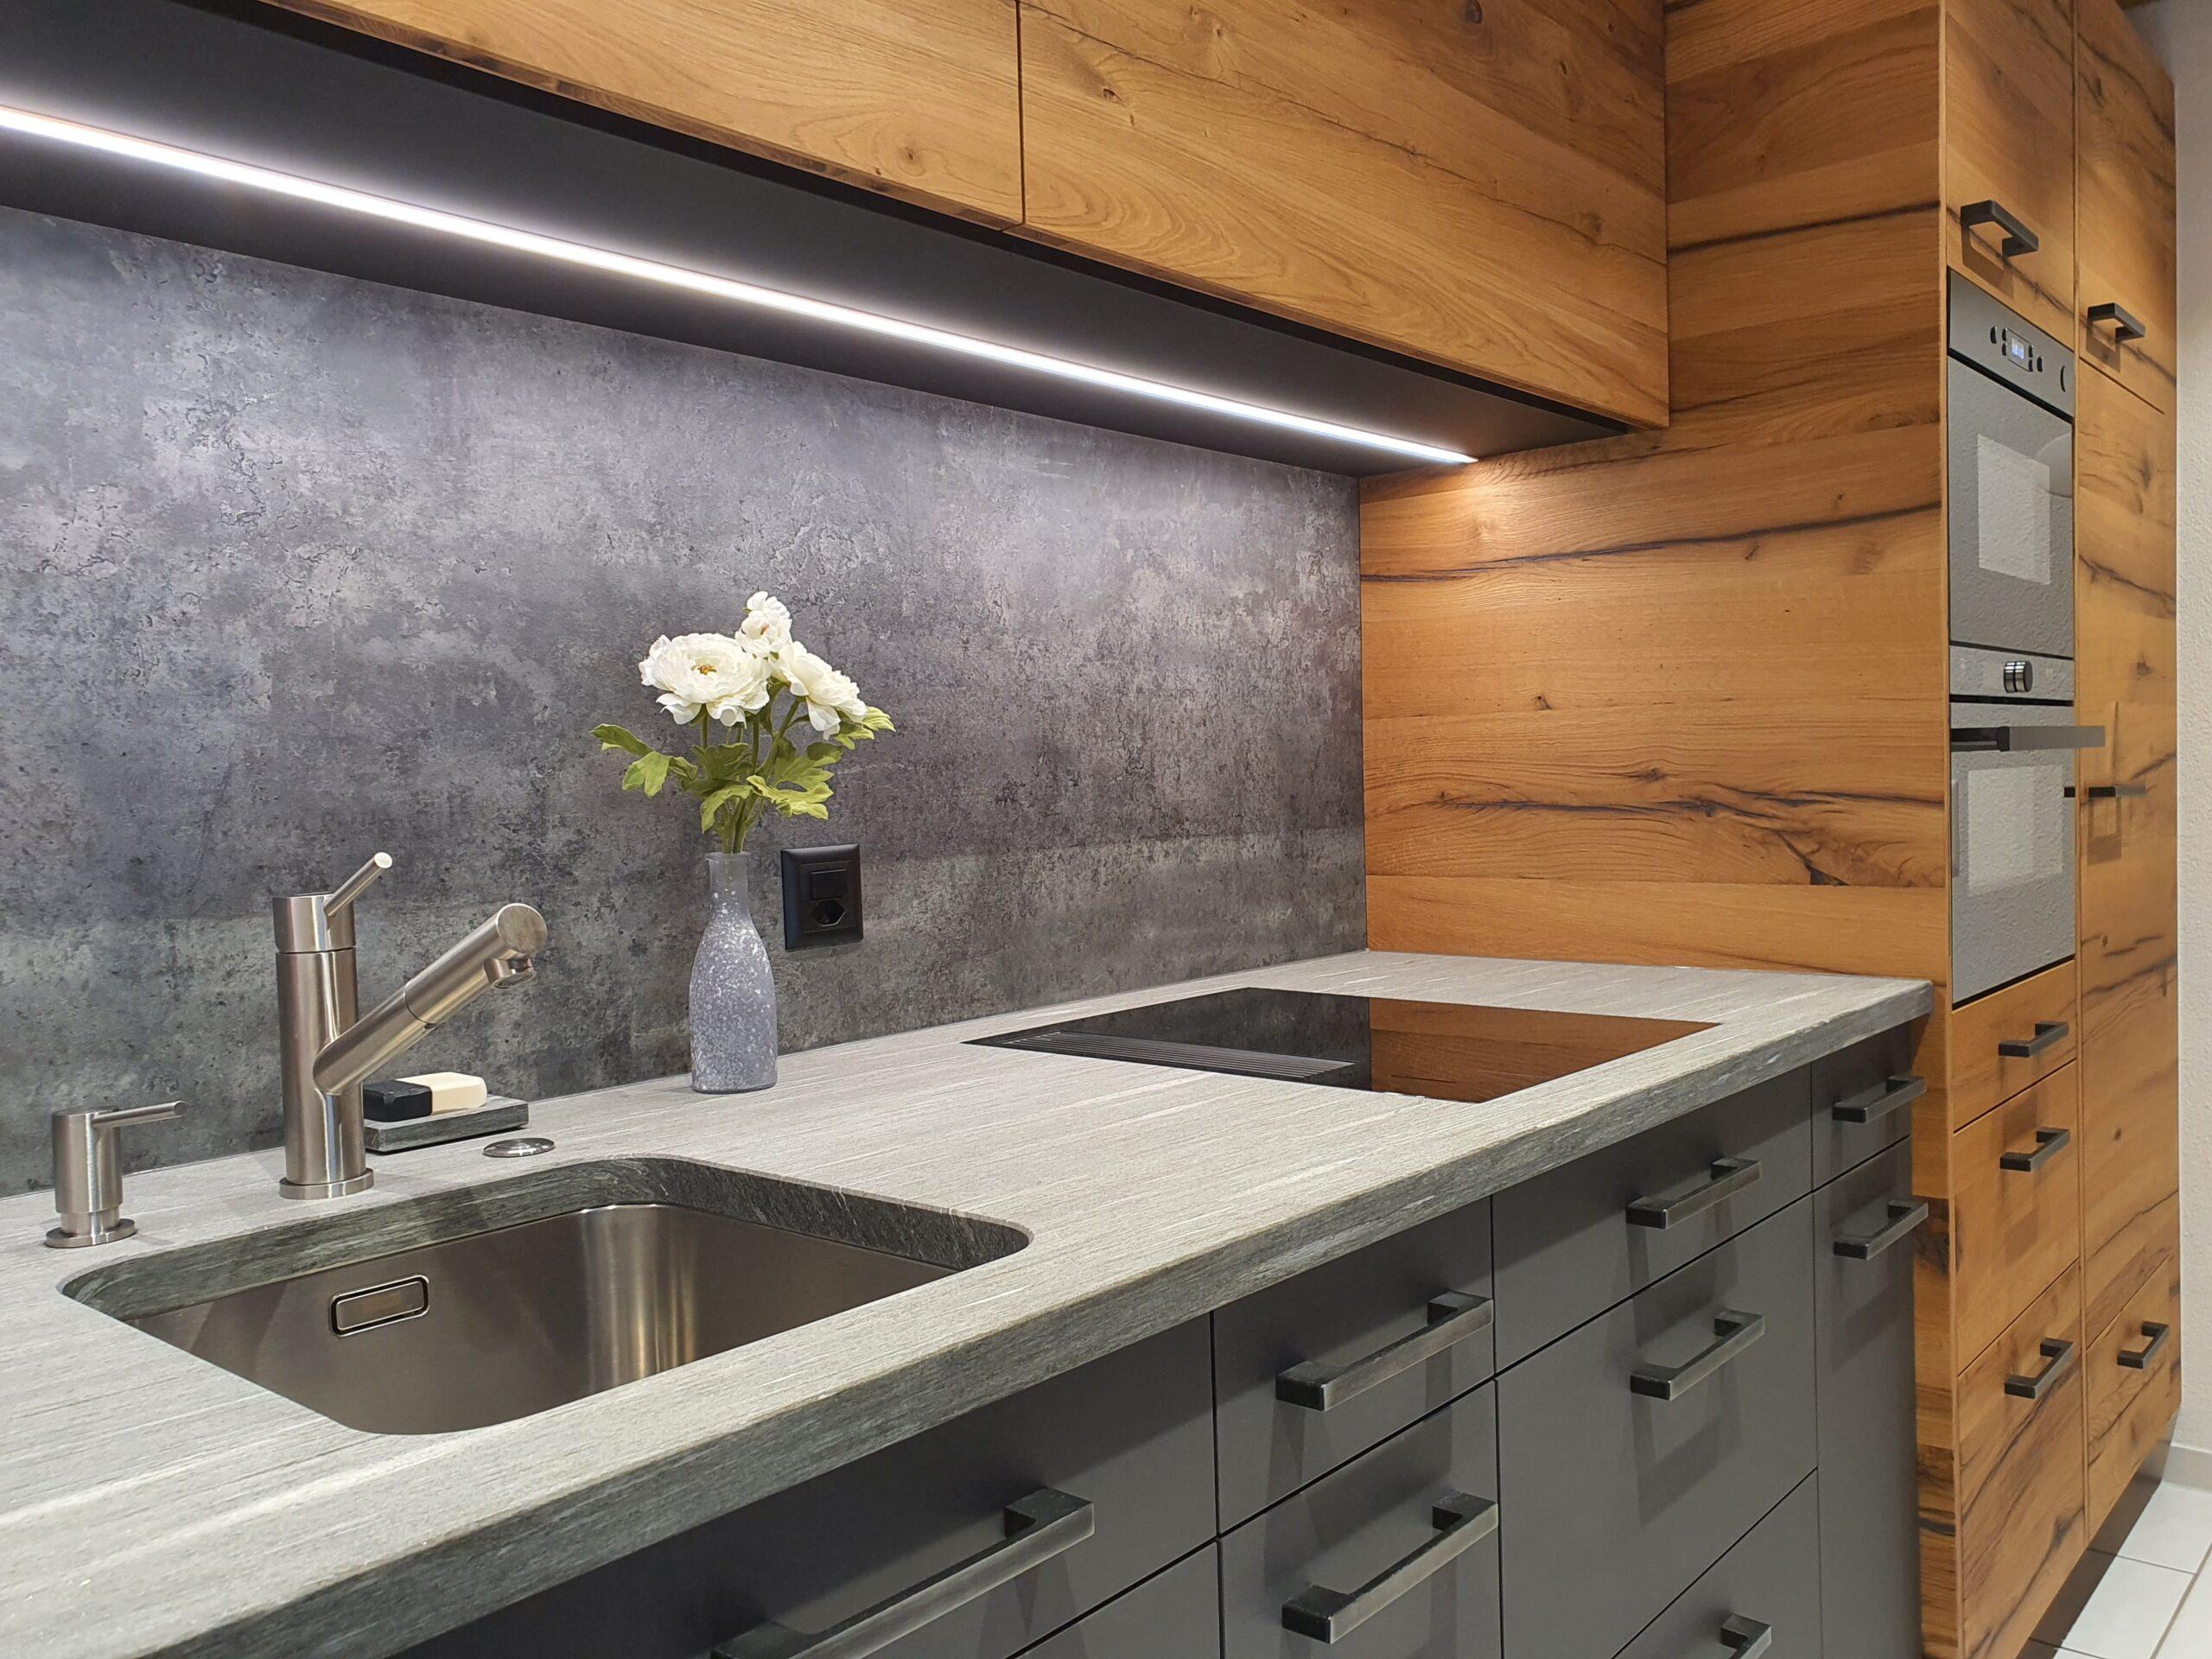 Wooddesign_Holzdesign_Küche aus Altholz_Eiche Altholz_modern_rustikal_LED-Beleuchtung_Ferienwohnung_anthrazit_Altholzdecke (4)